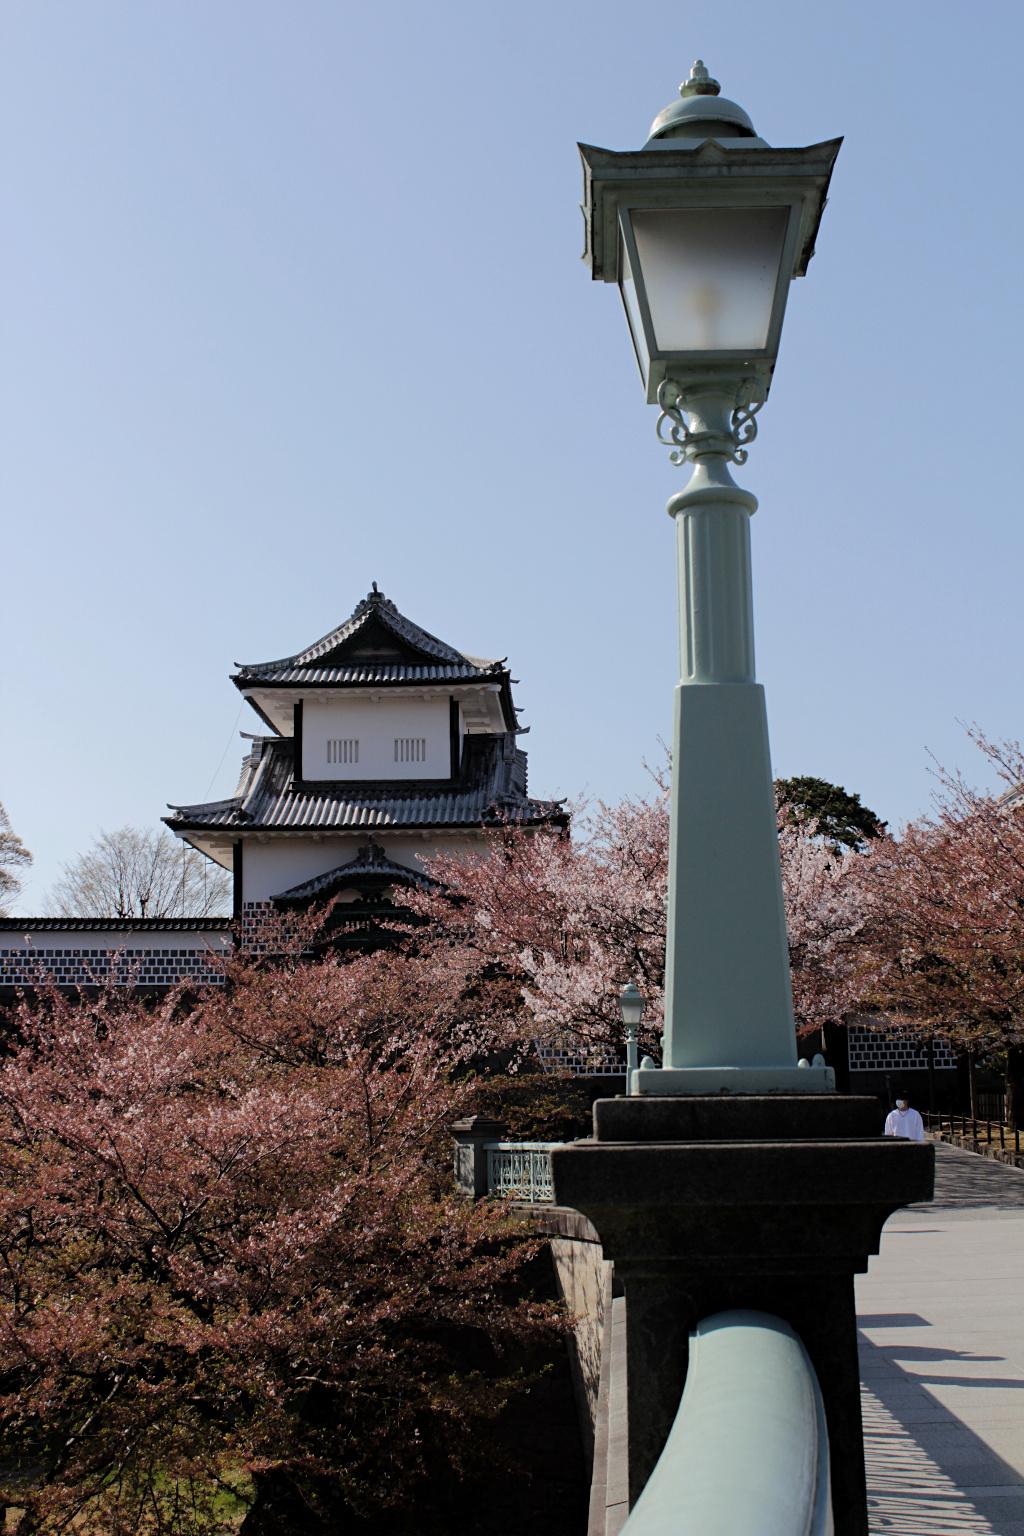 The view of Ishikawa-mon Gate of Kanazawa Castle from Kenrokuen Garden.